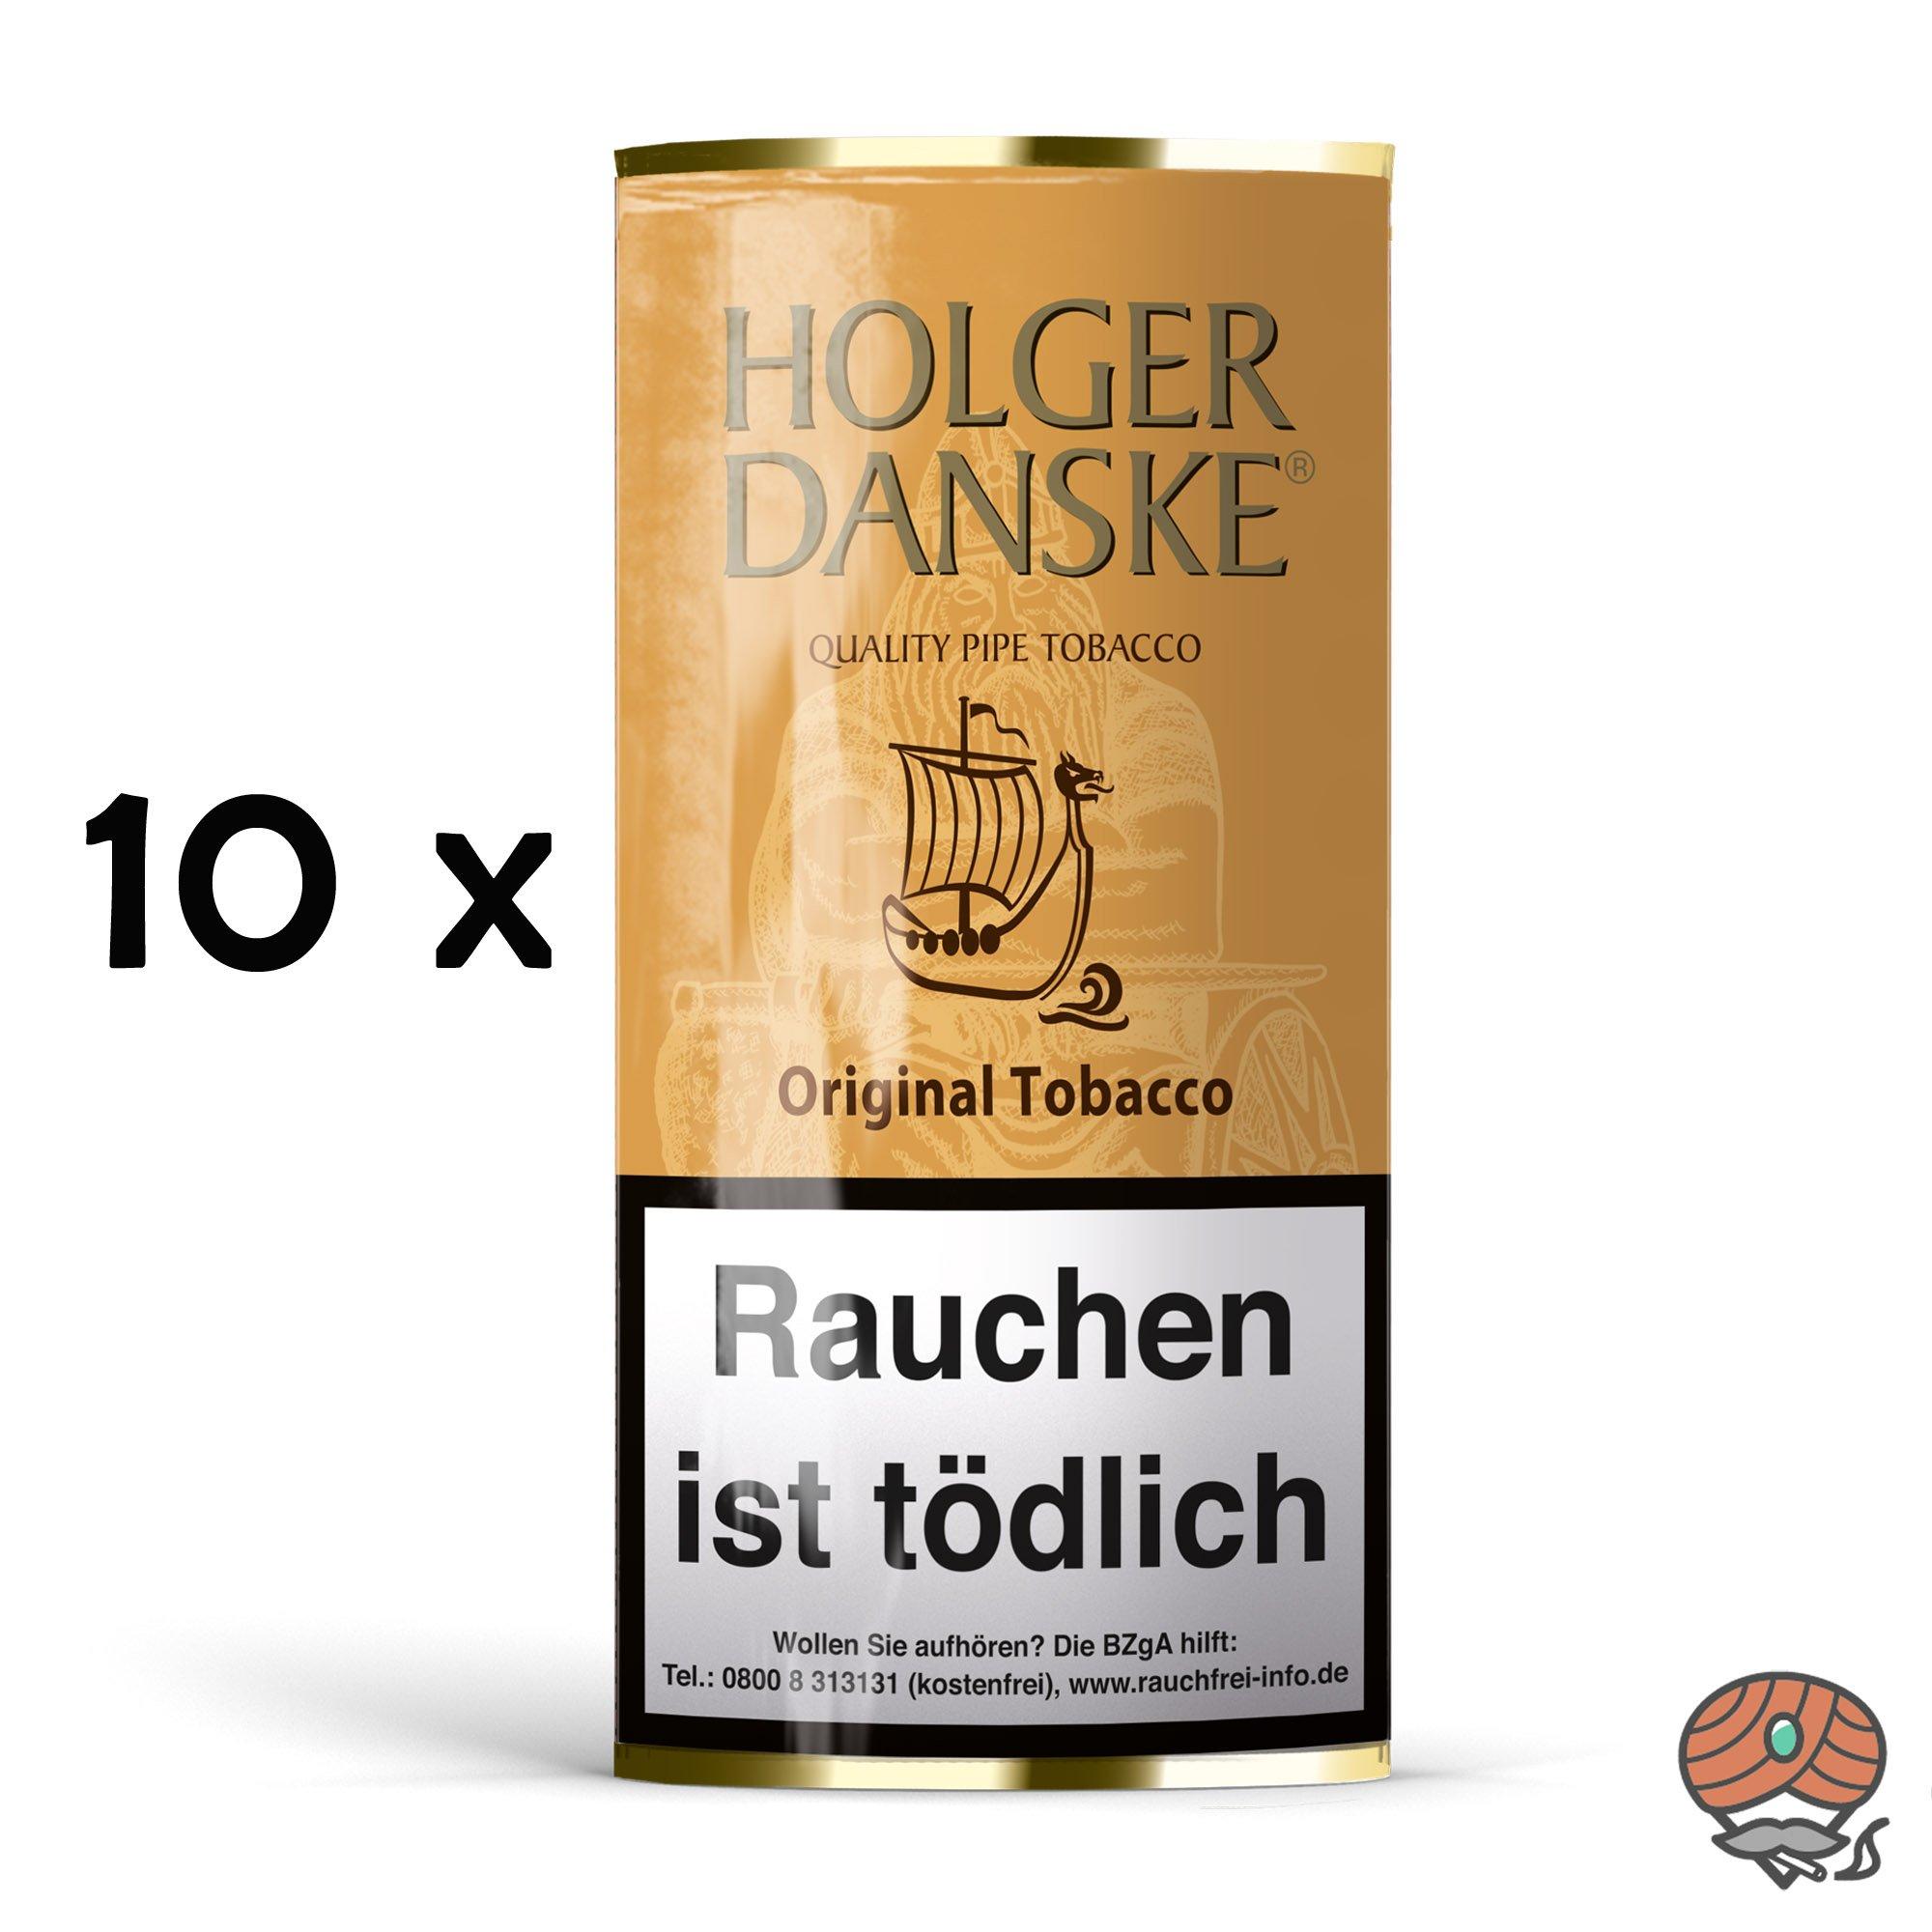 10x Holger Danske Original Tobacco Pfeifentabak à 40g